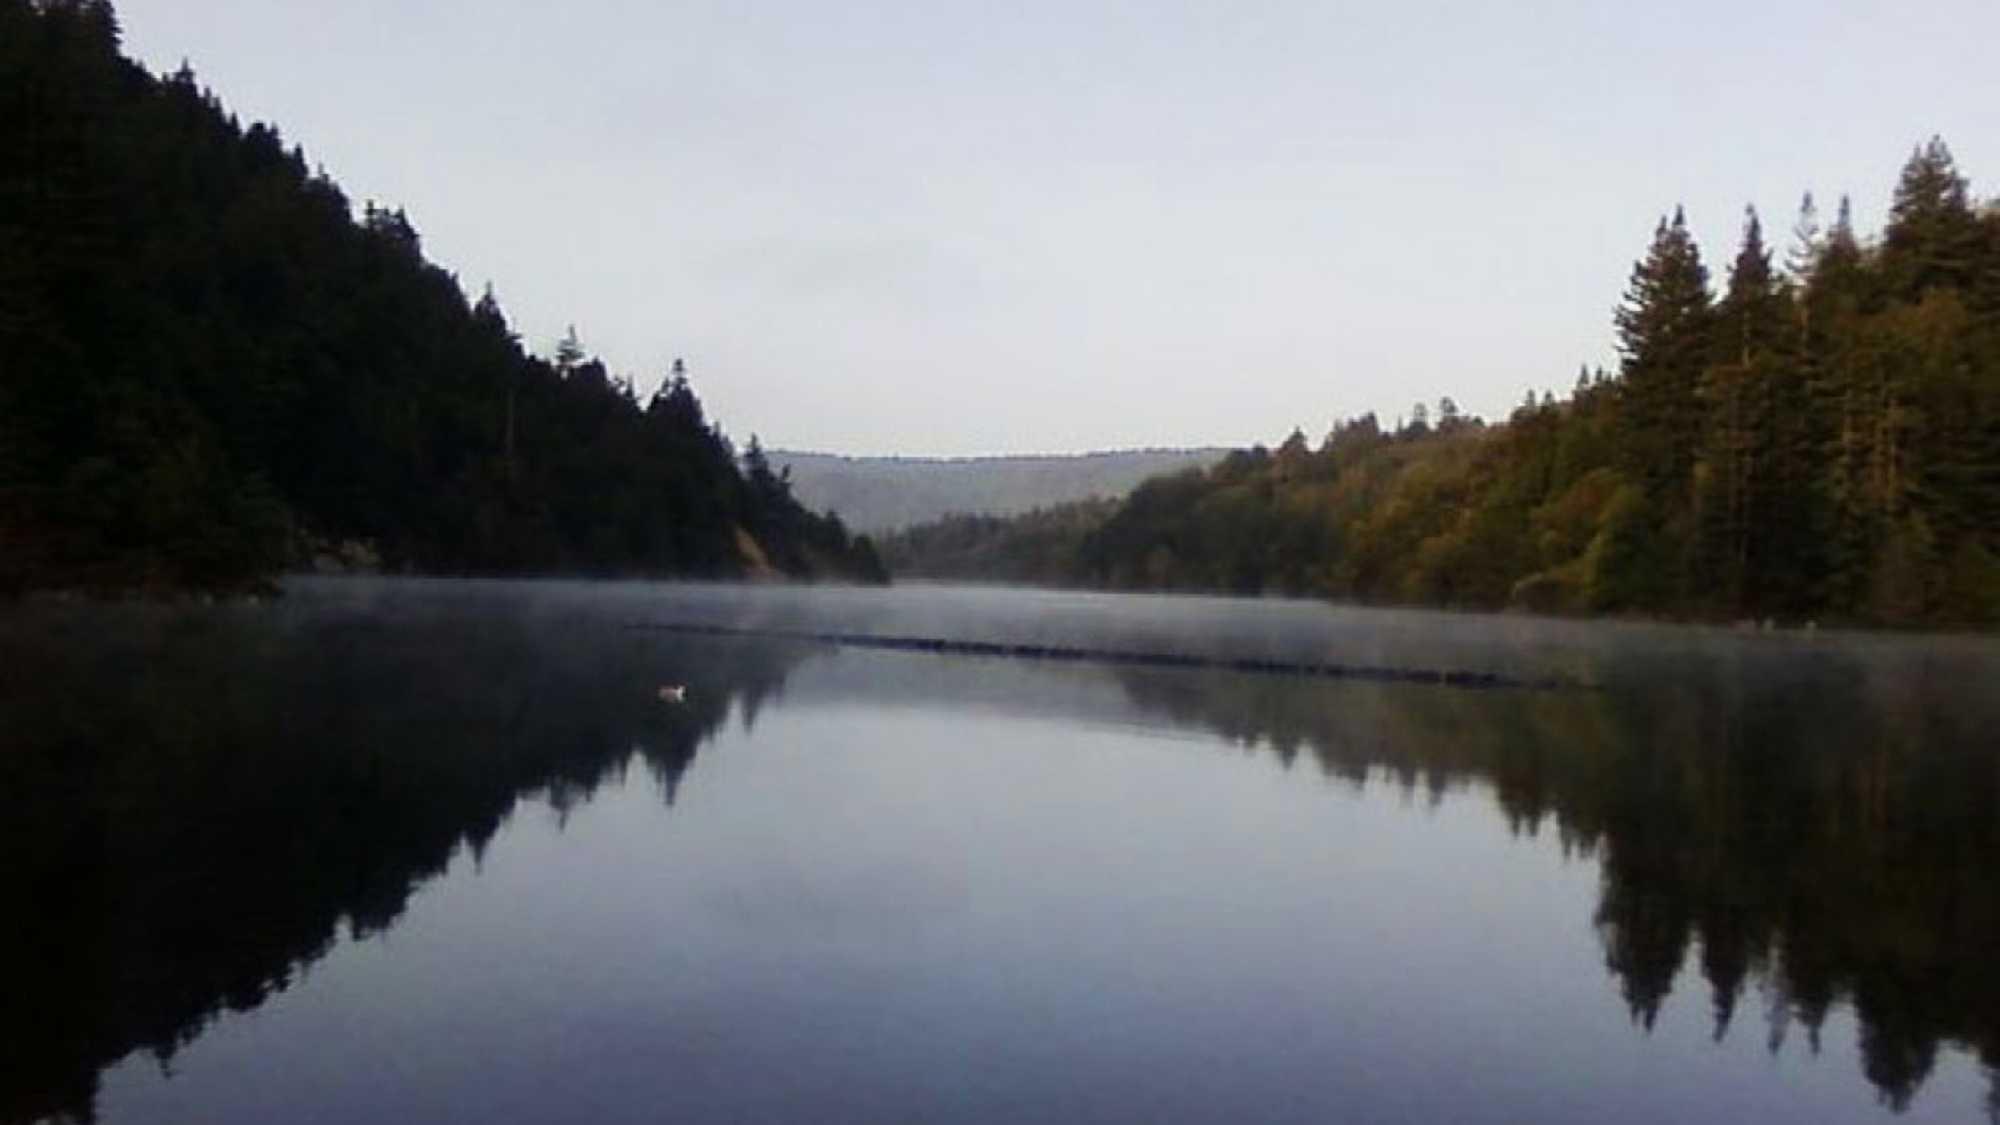 Loch Lomond Reservoir